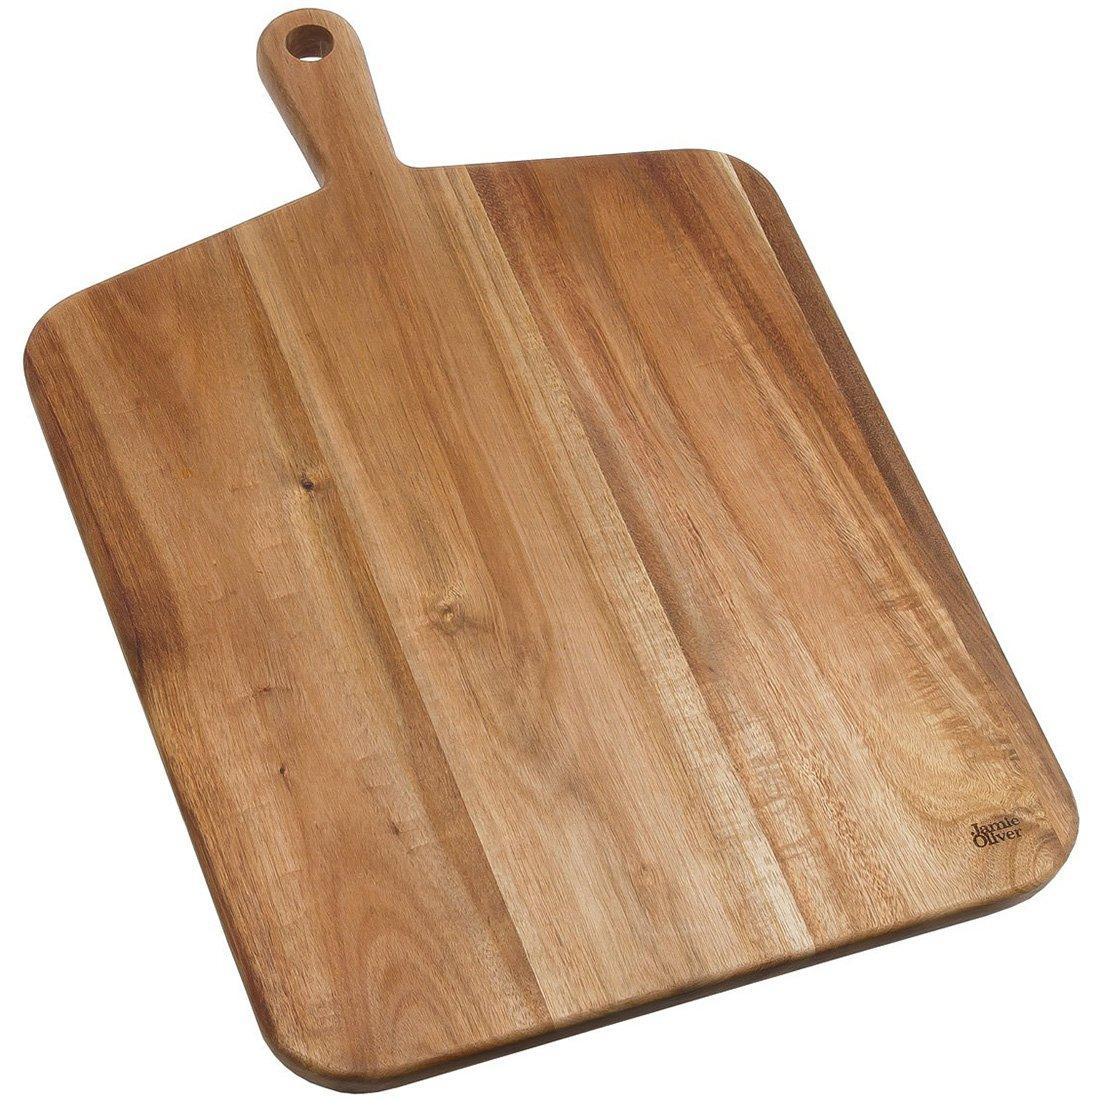 Jamie Oliver acacia wood rustic board